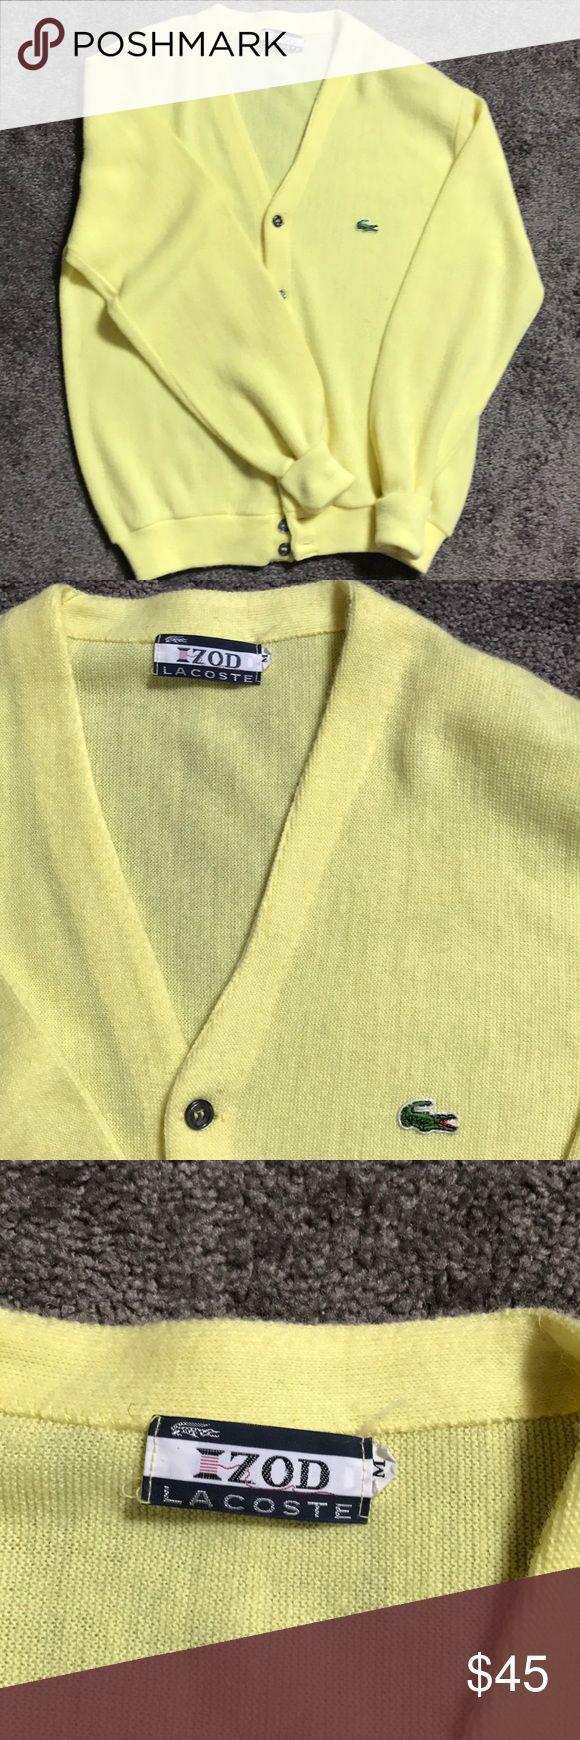 Vintage 70s IZOD Lacoste Cardigan Sweater M EUC Vintage Cardigan  Gray Pearled Buttons Lacoste Sweaters Cardigan